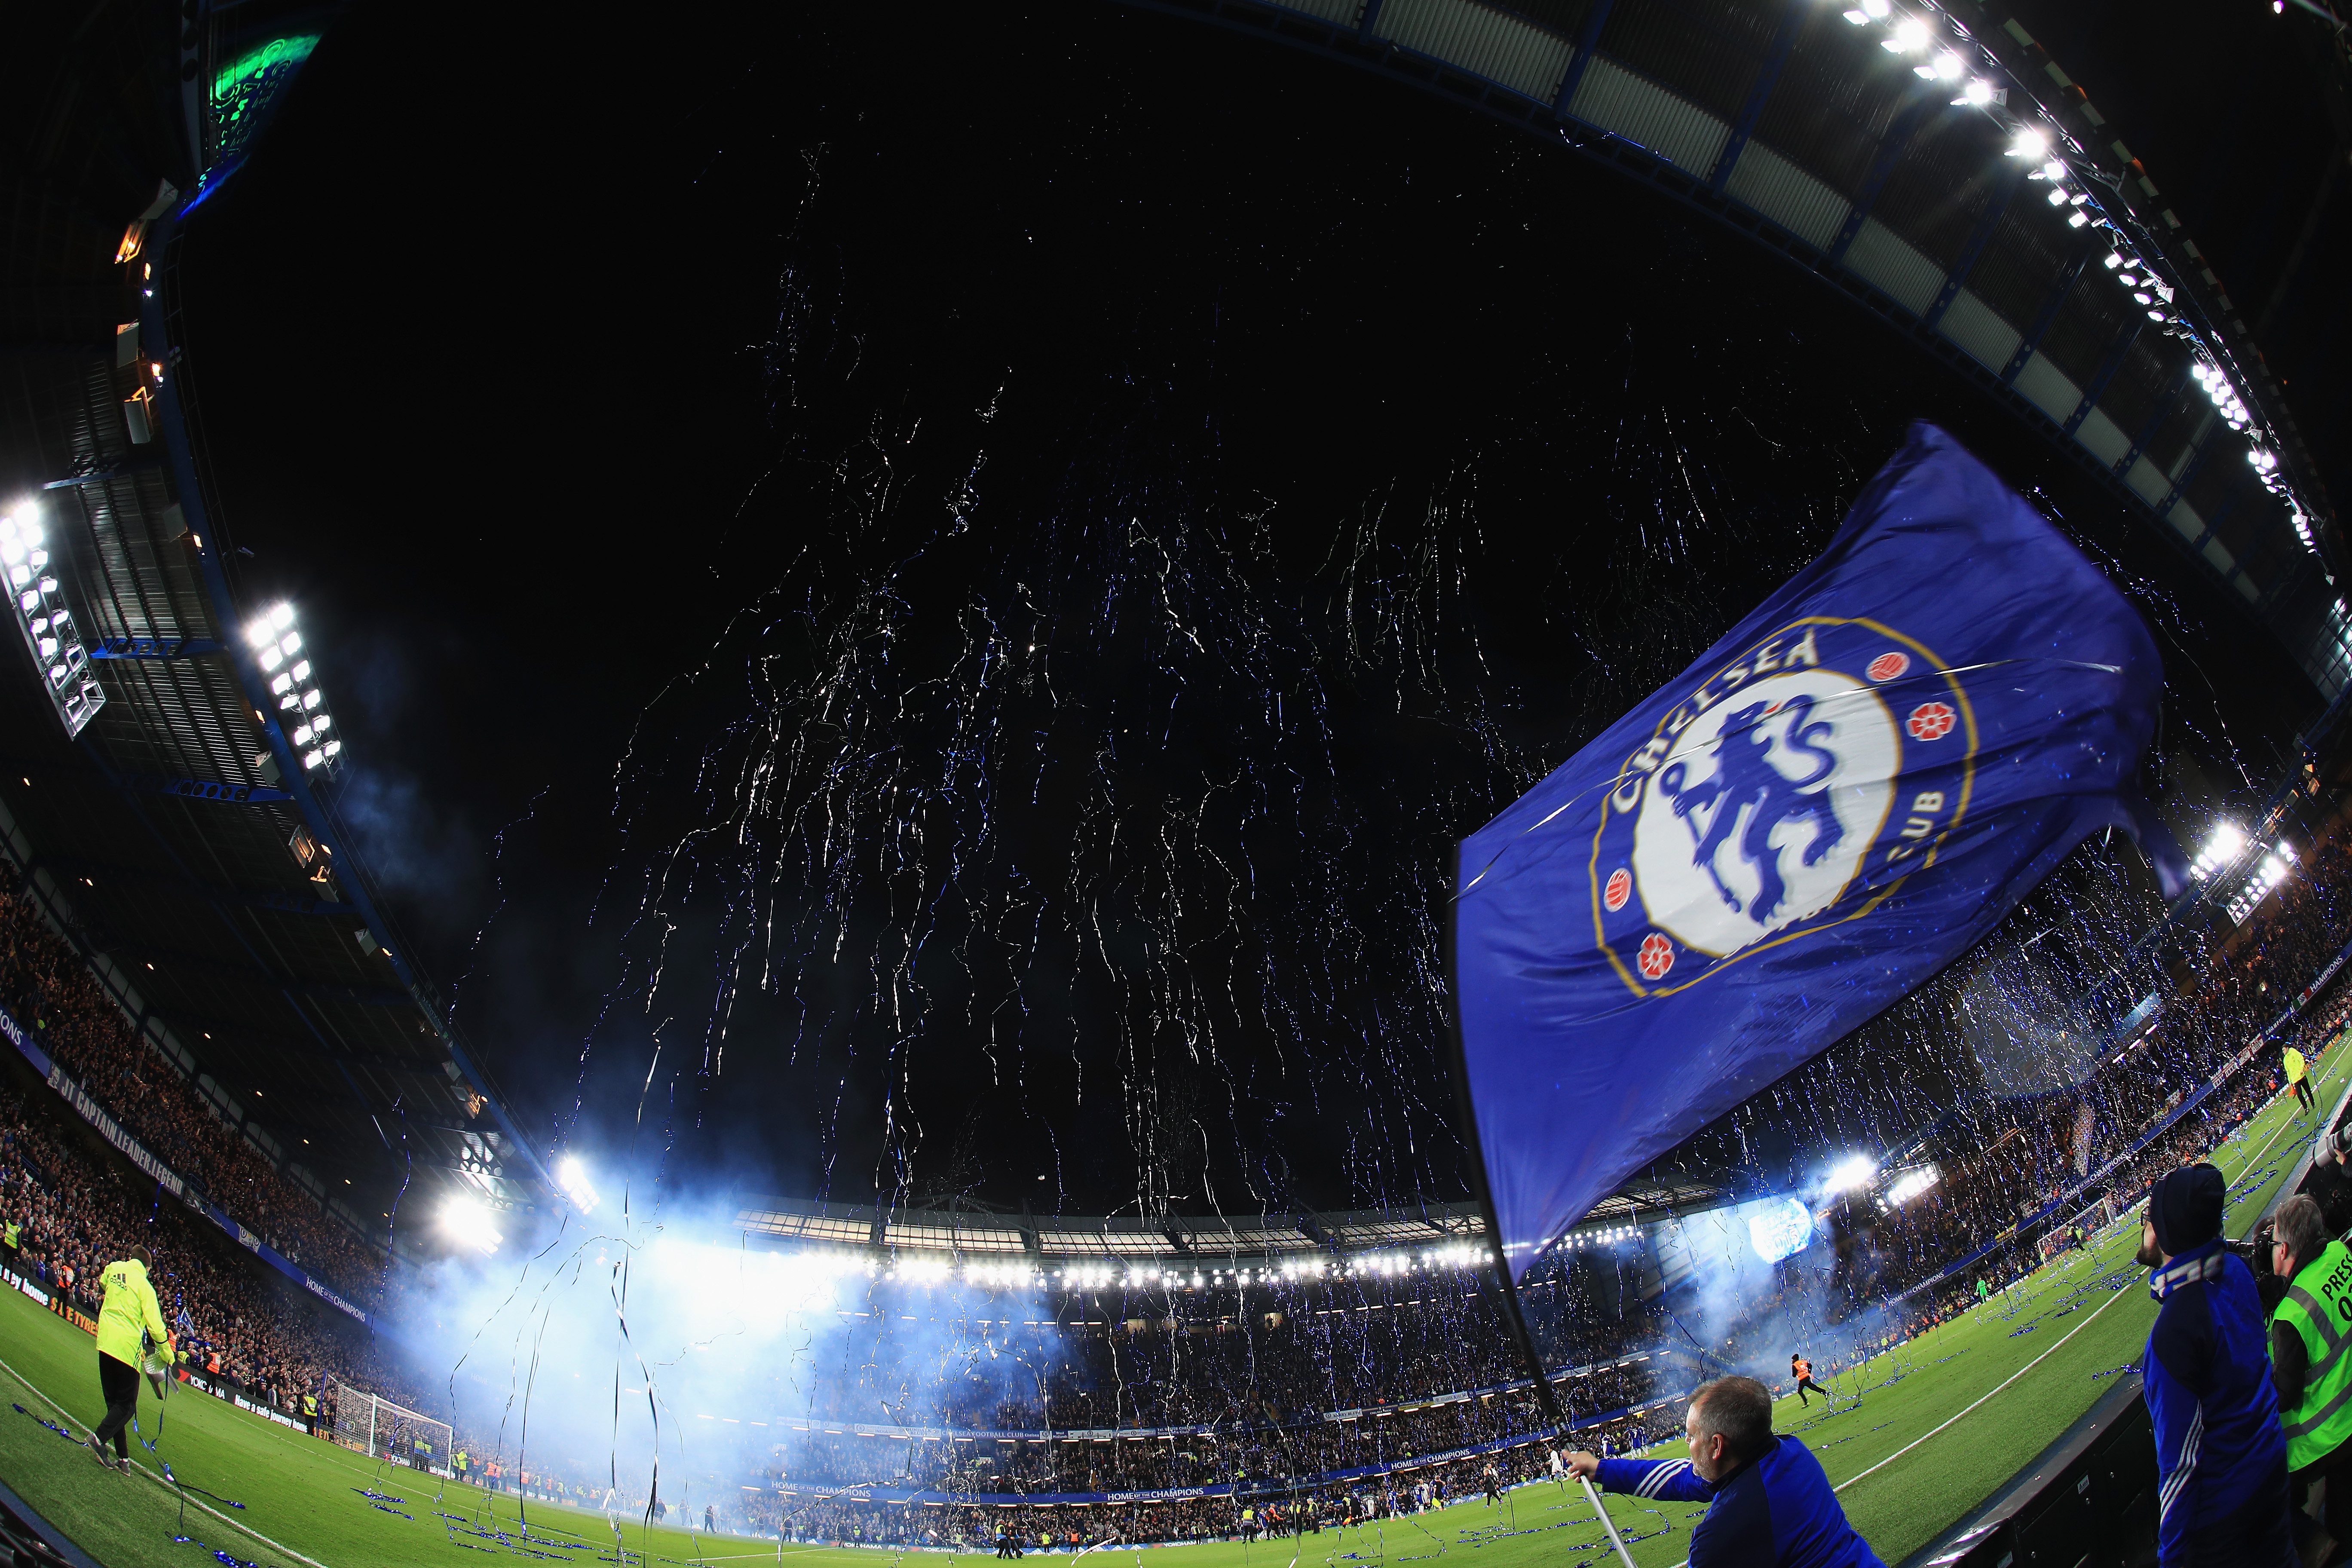 прогнозы на футбол чемпионат англии чемпион лига